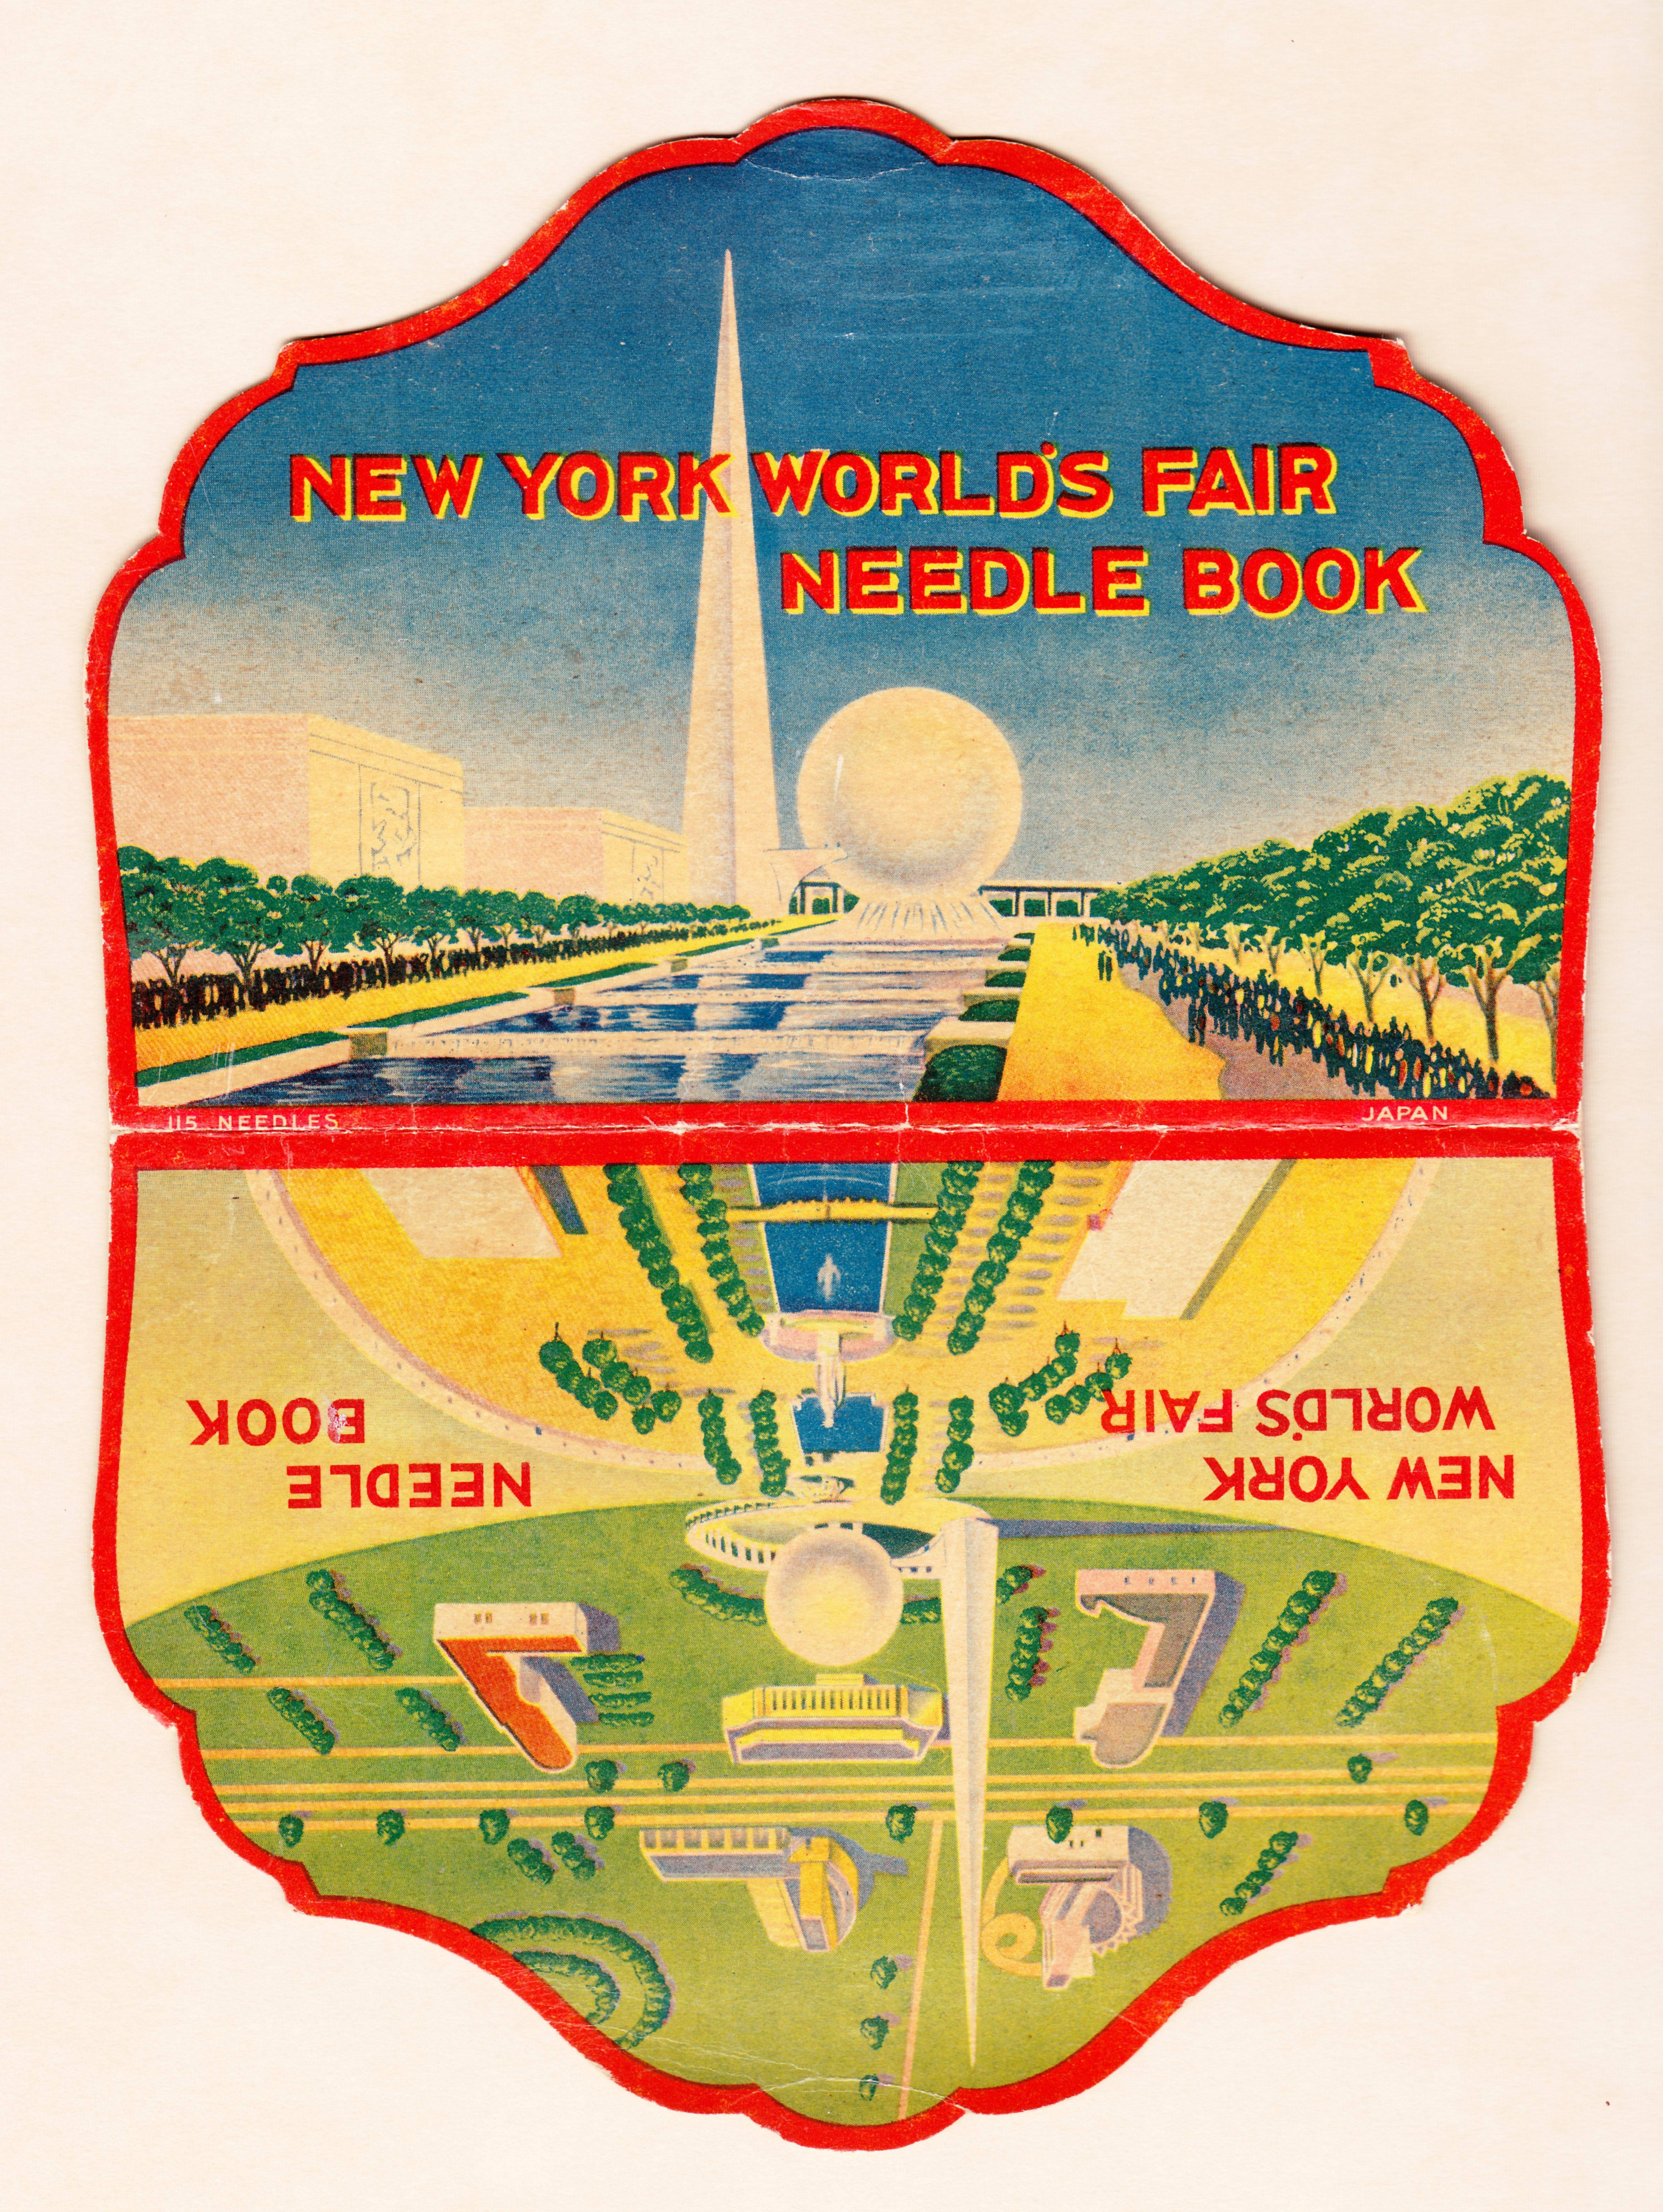 1939 New York World's Fair Needle Book